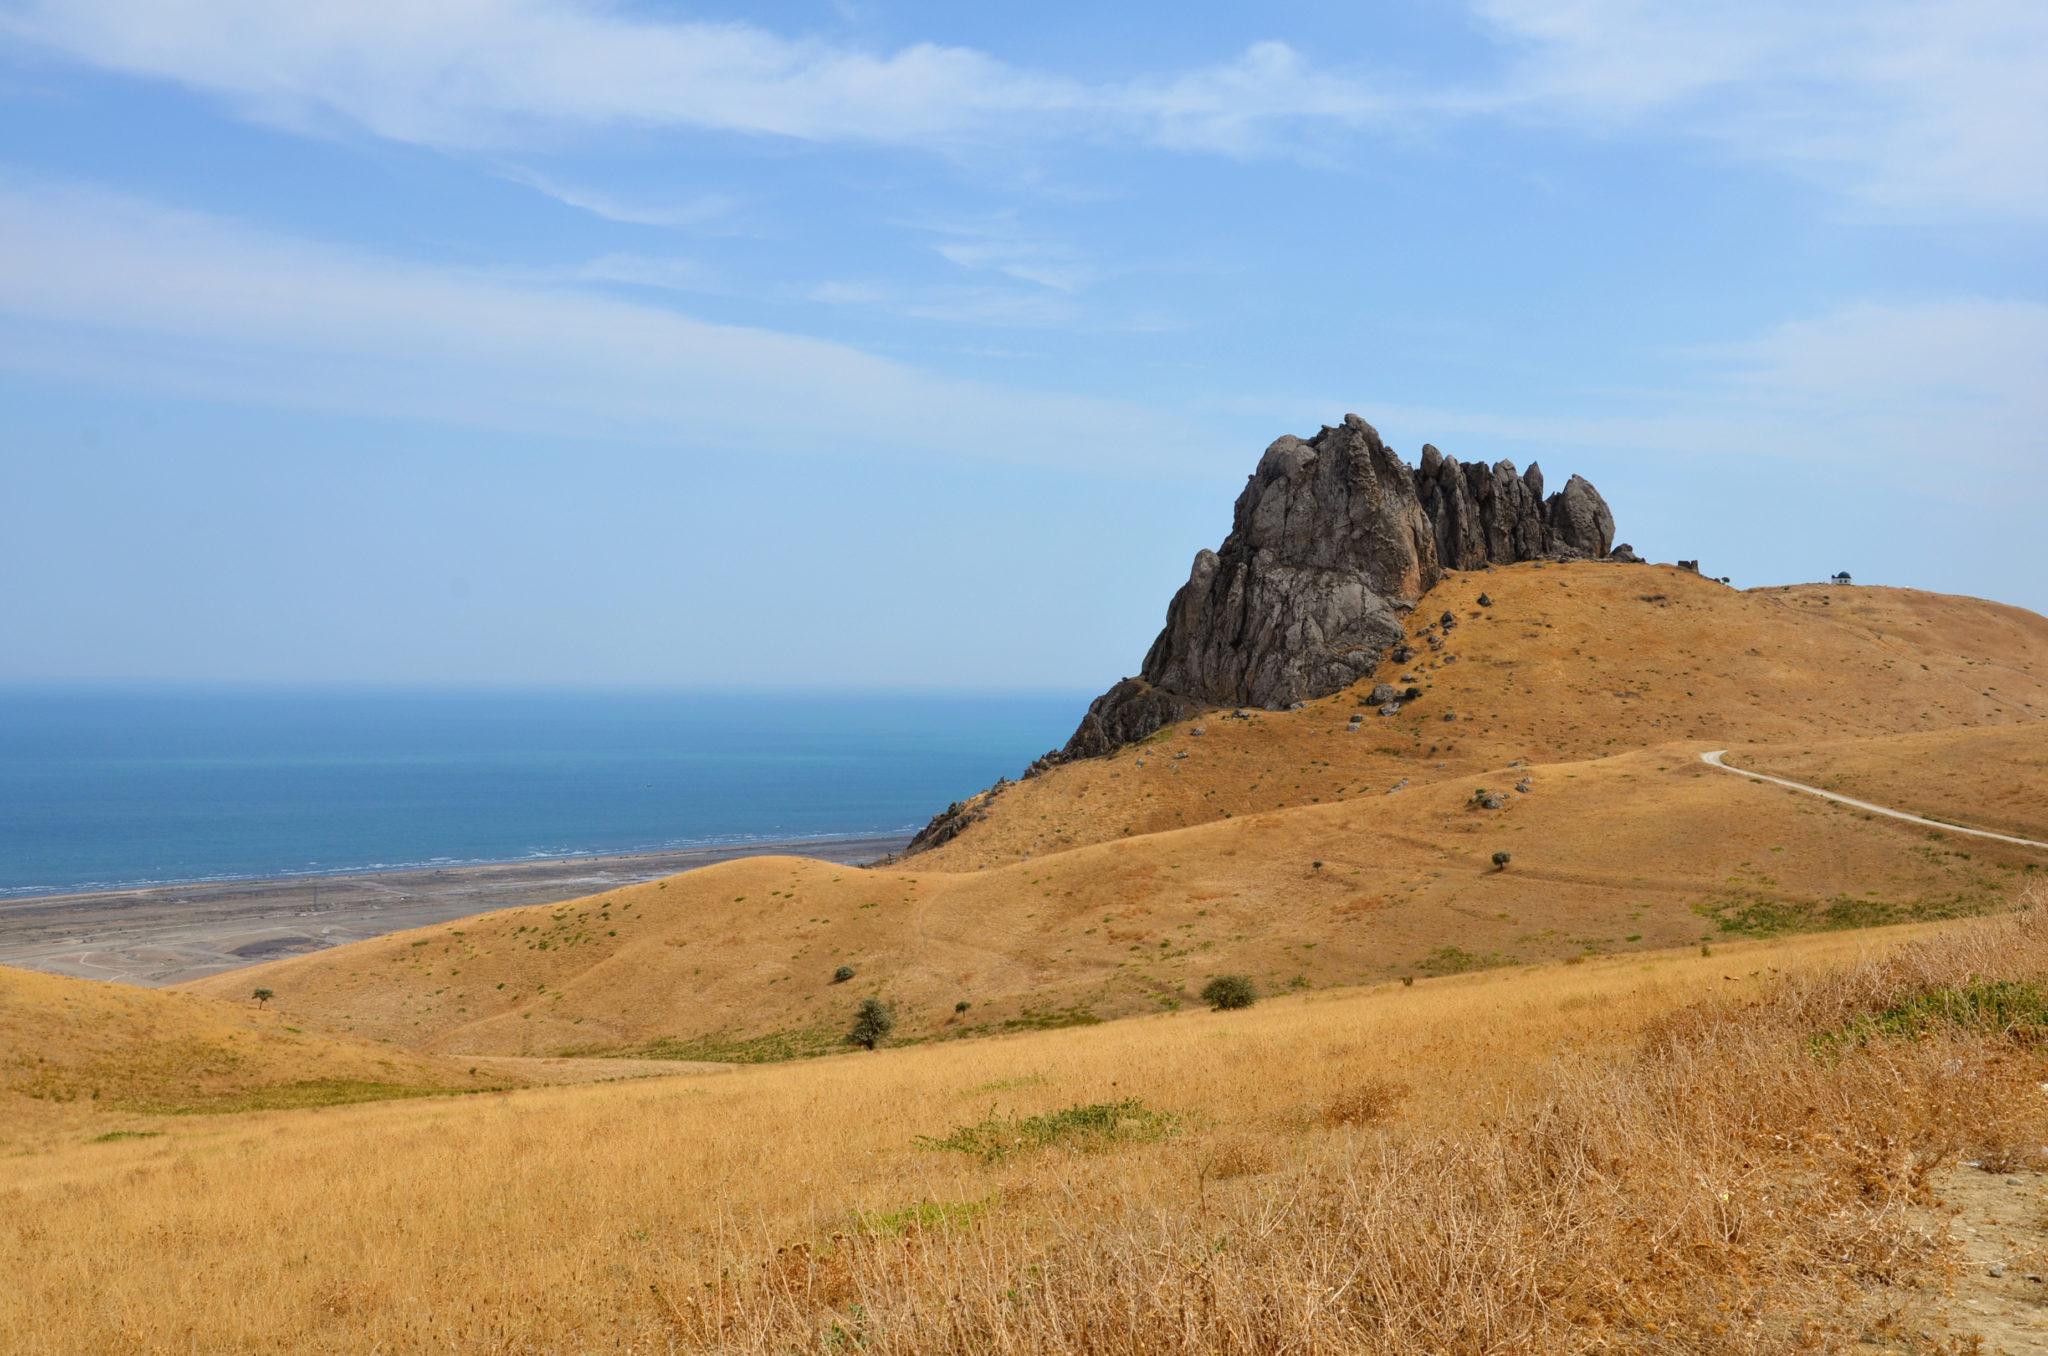 Aserbaidschan-Reisetipps-Fünf-Finger-Berg-Pilgerstaette